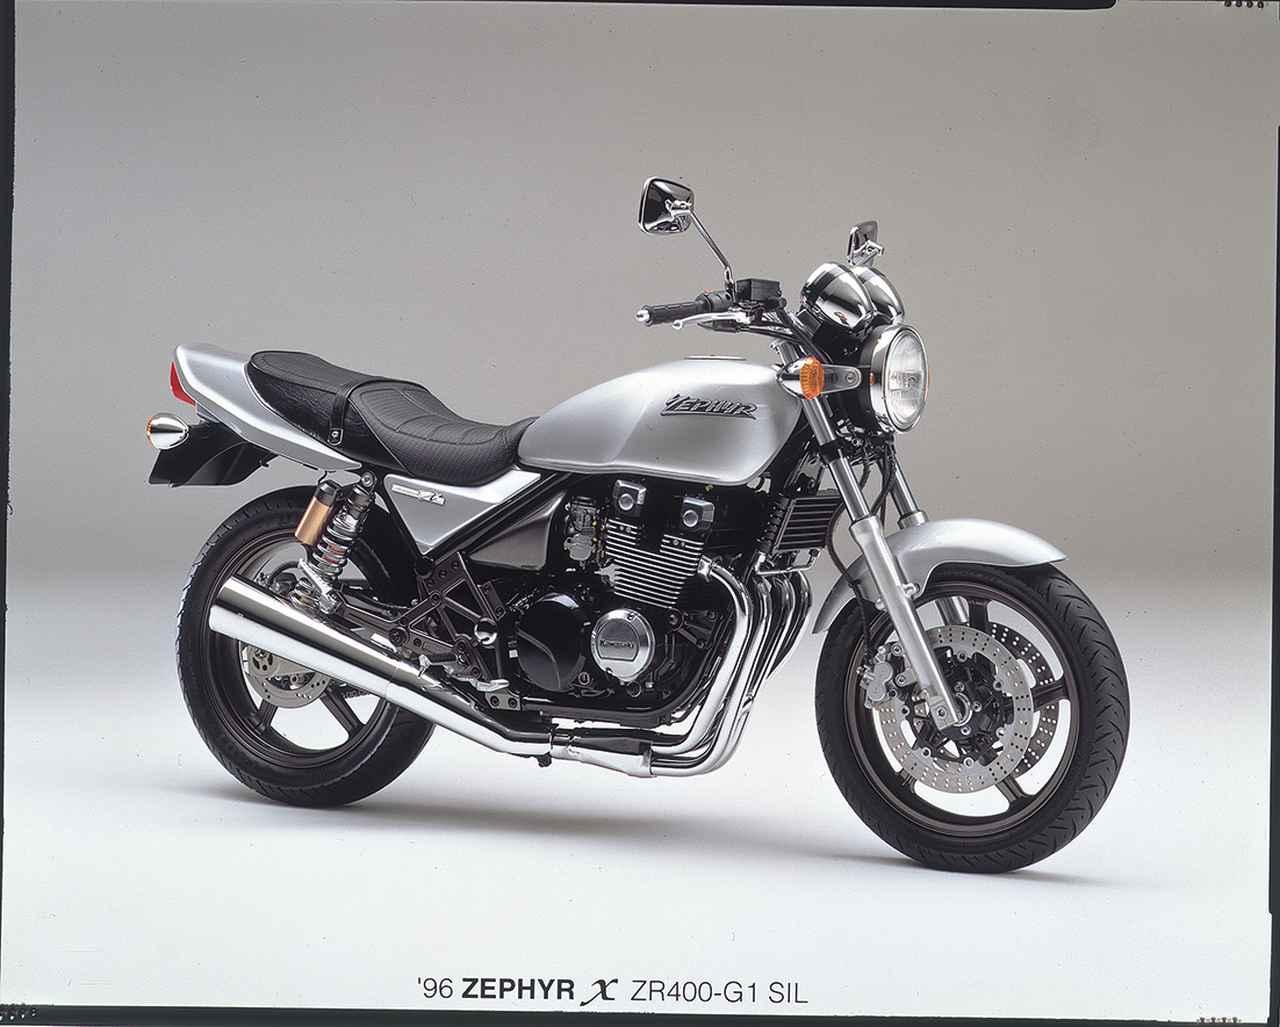 Images : 1996/3 ZEPHYR X